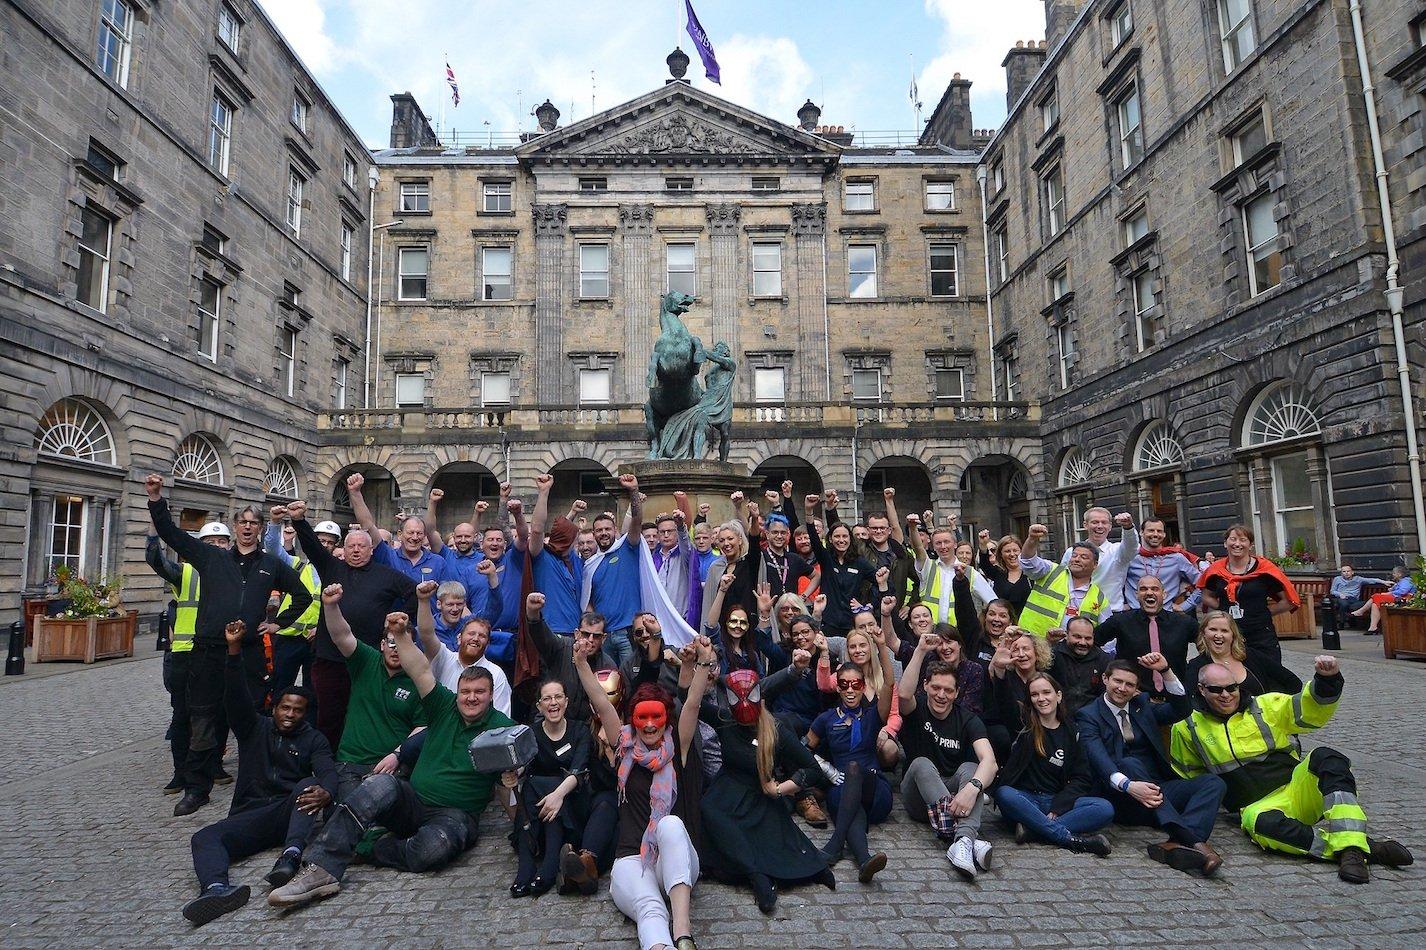 Film Edinburgh hails its backroom superheroes – Daily Business